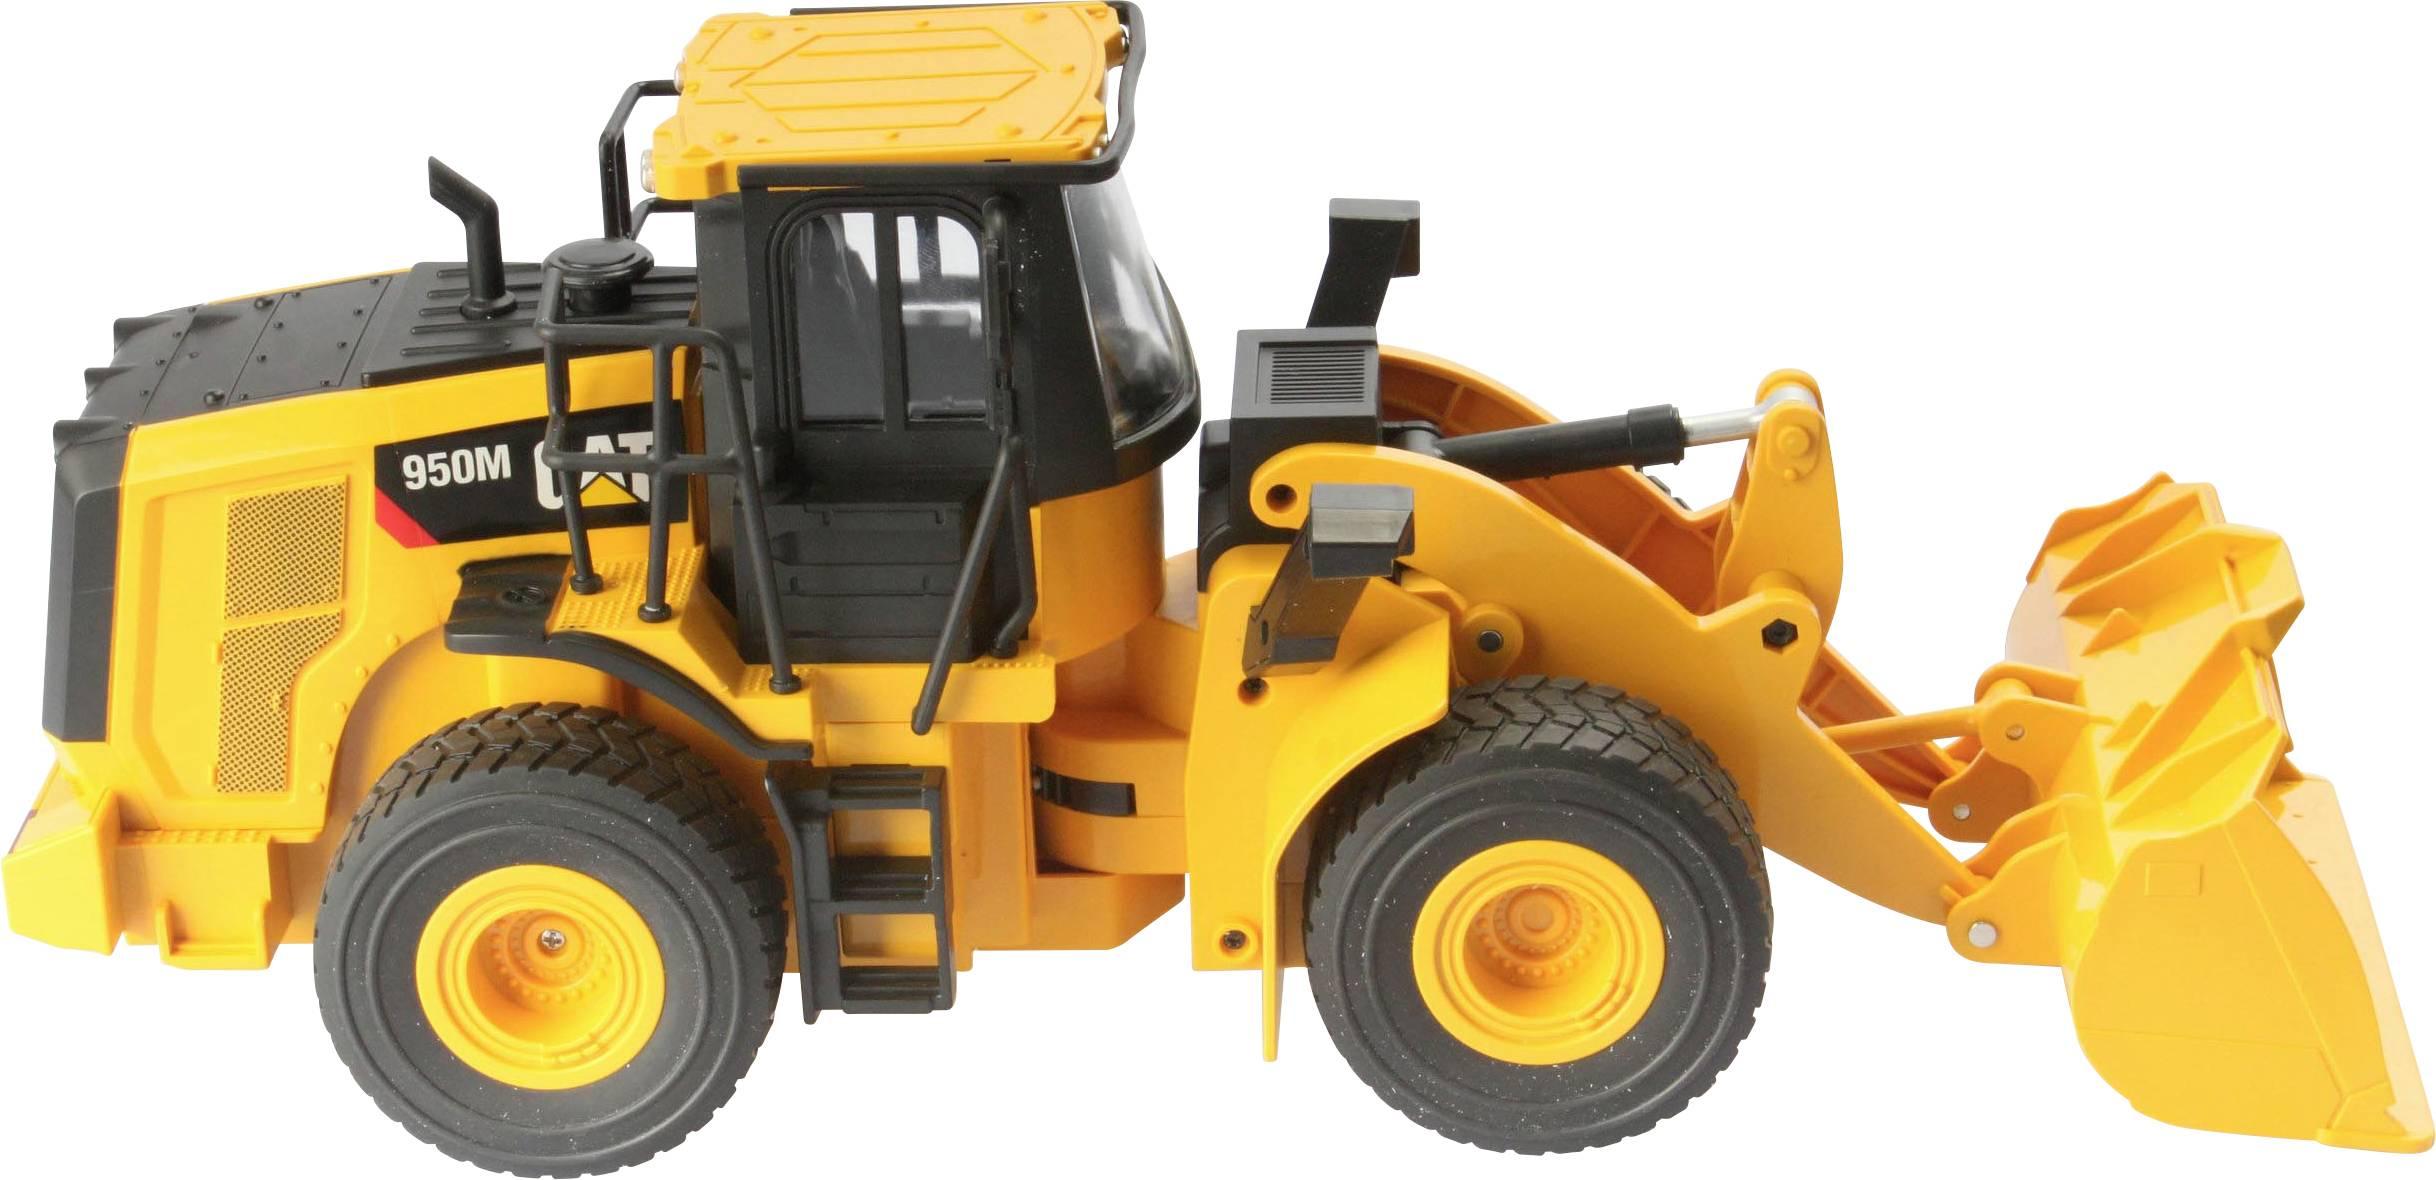 Diecast Masters 25003 Cat® Radlader 1:24  rc funkcijski model